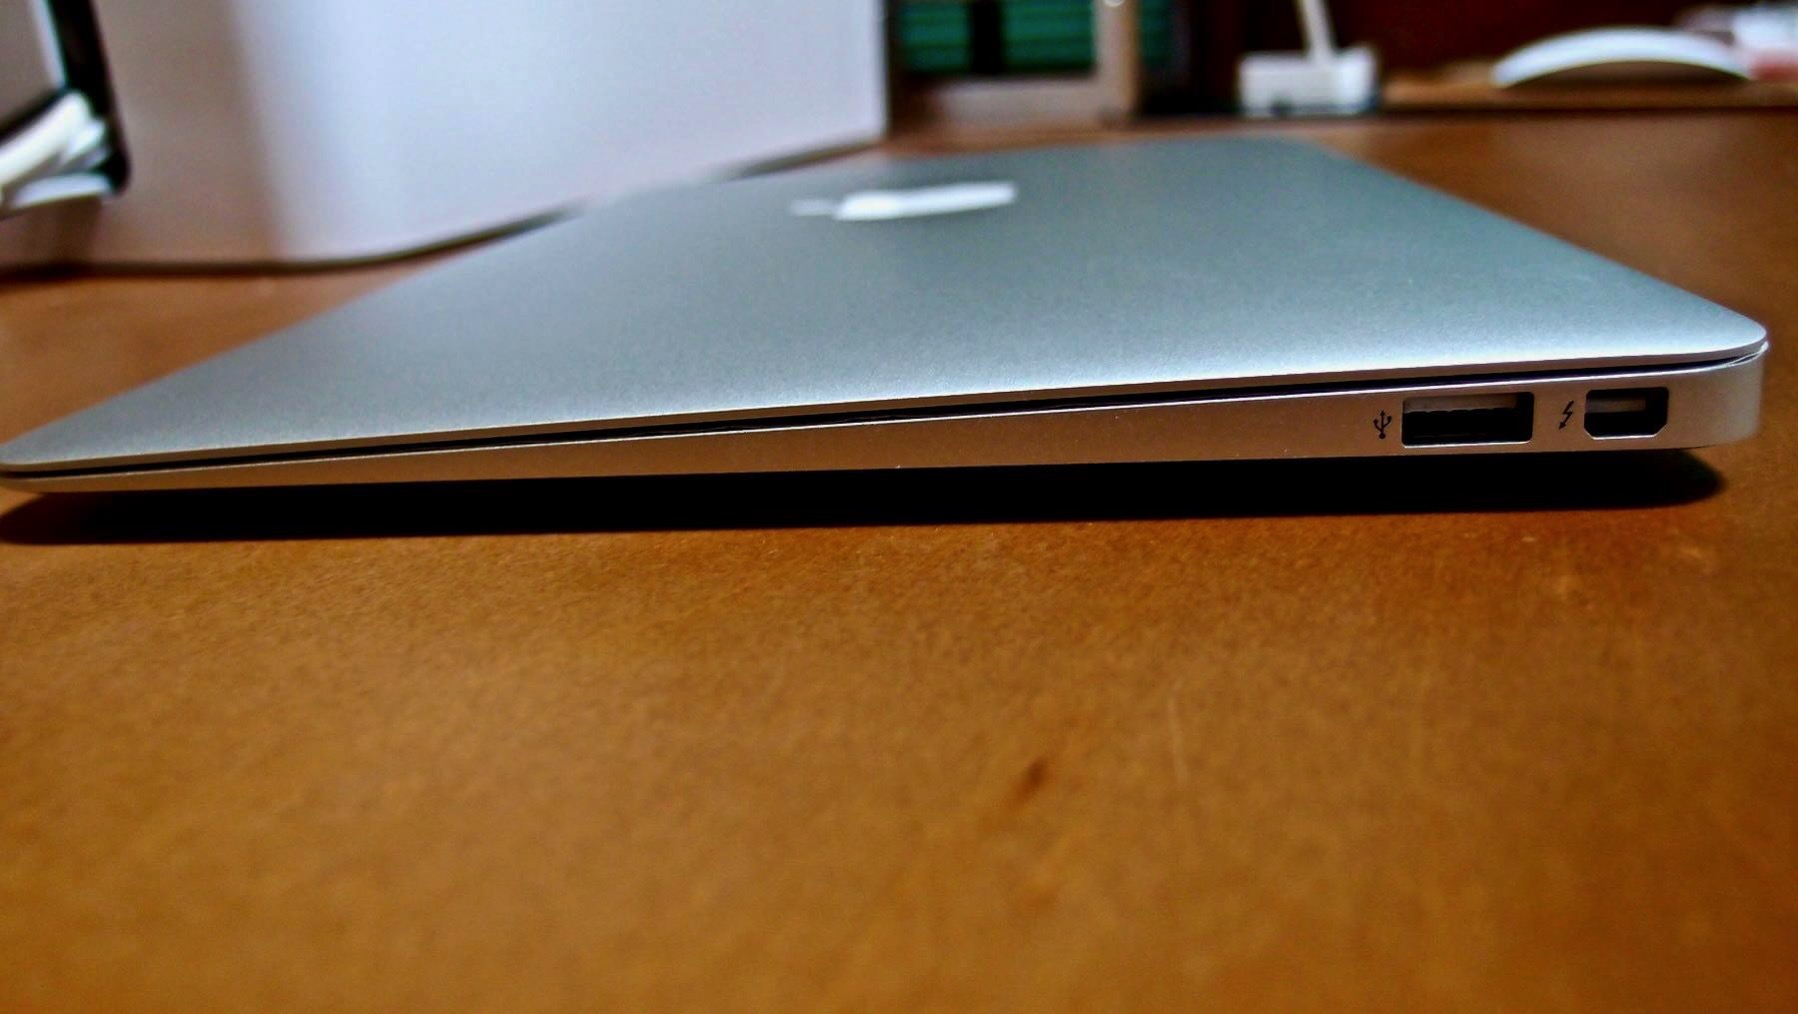 06 MacBook Air2013 Mid 11inch